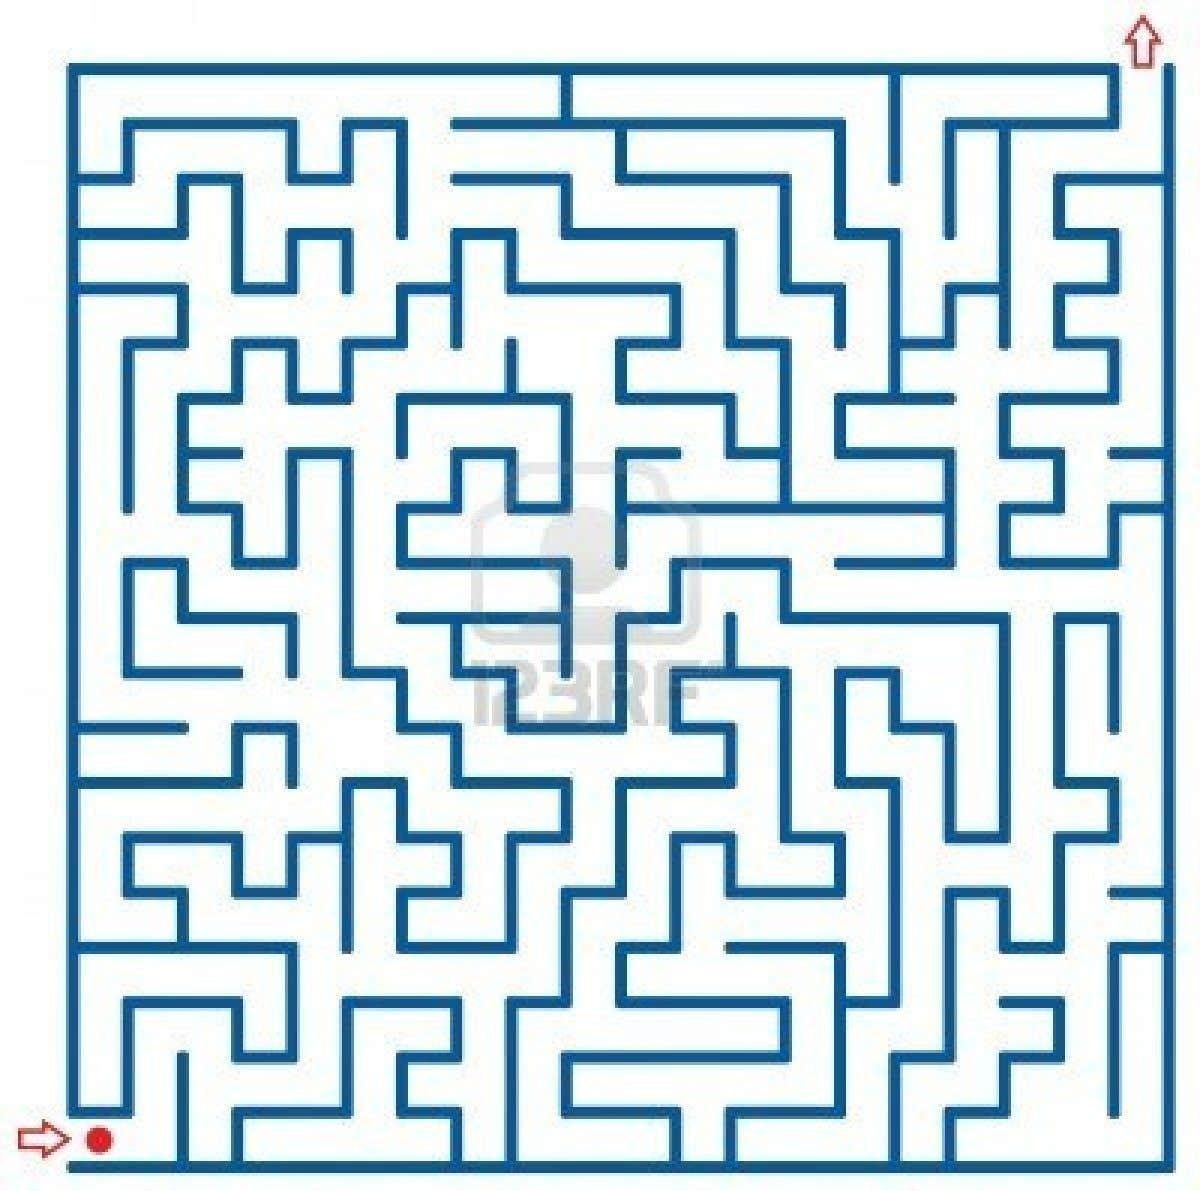 Play Super Duper incredible maze